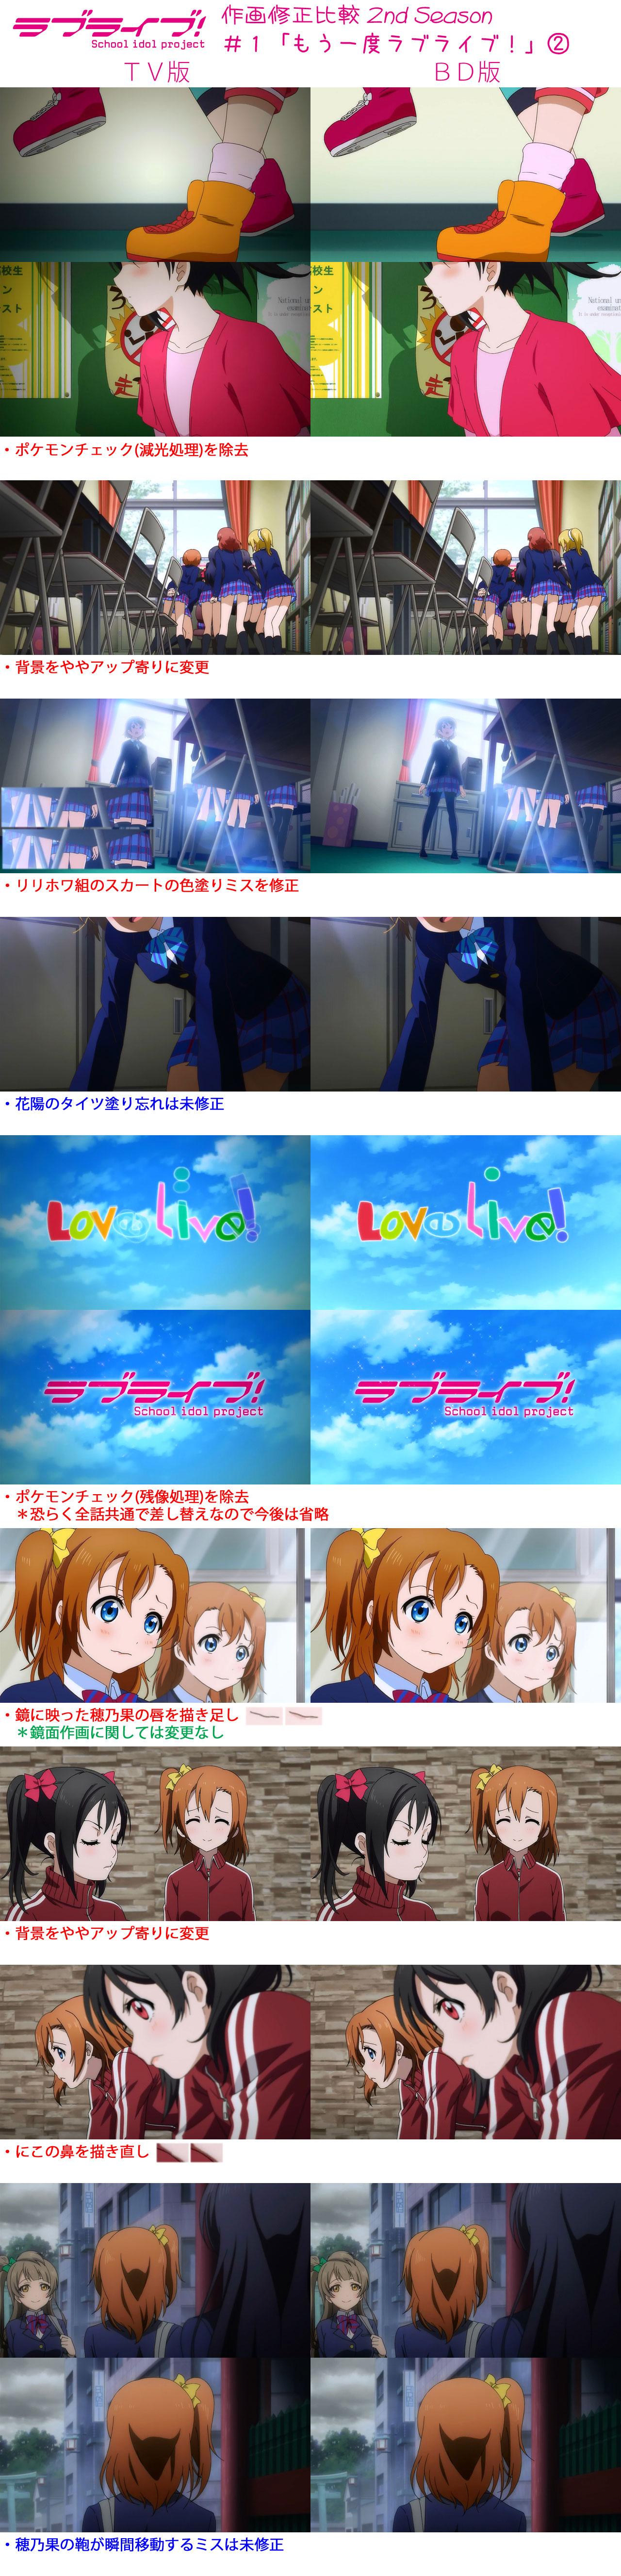 Love-Live!-School-Idol-Project-Season-2-TV-Blu-Ray-Comparison-2